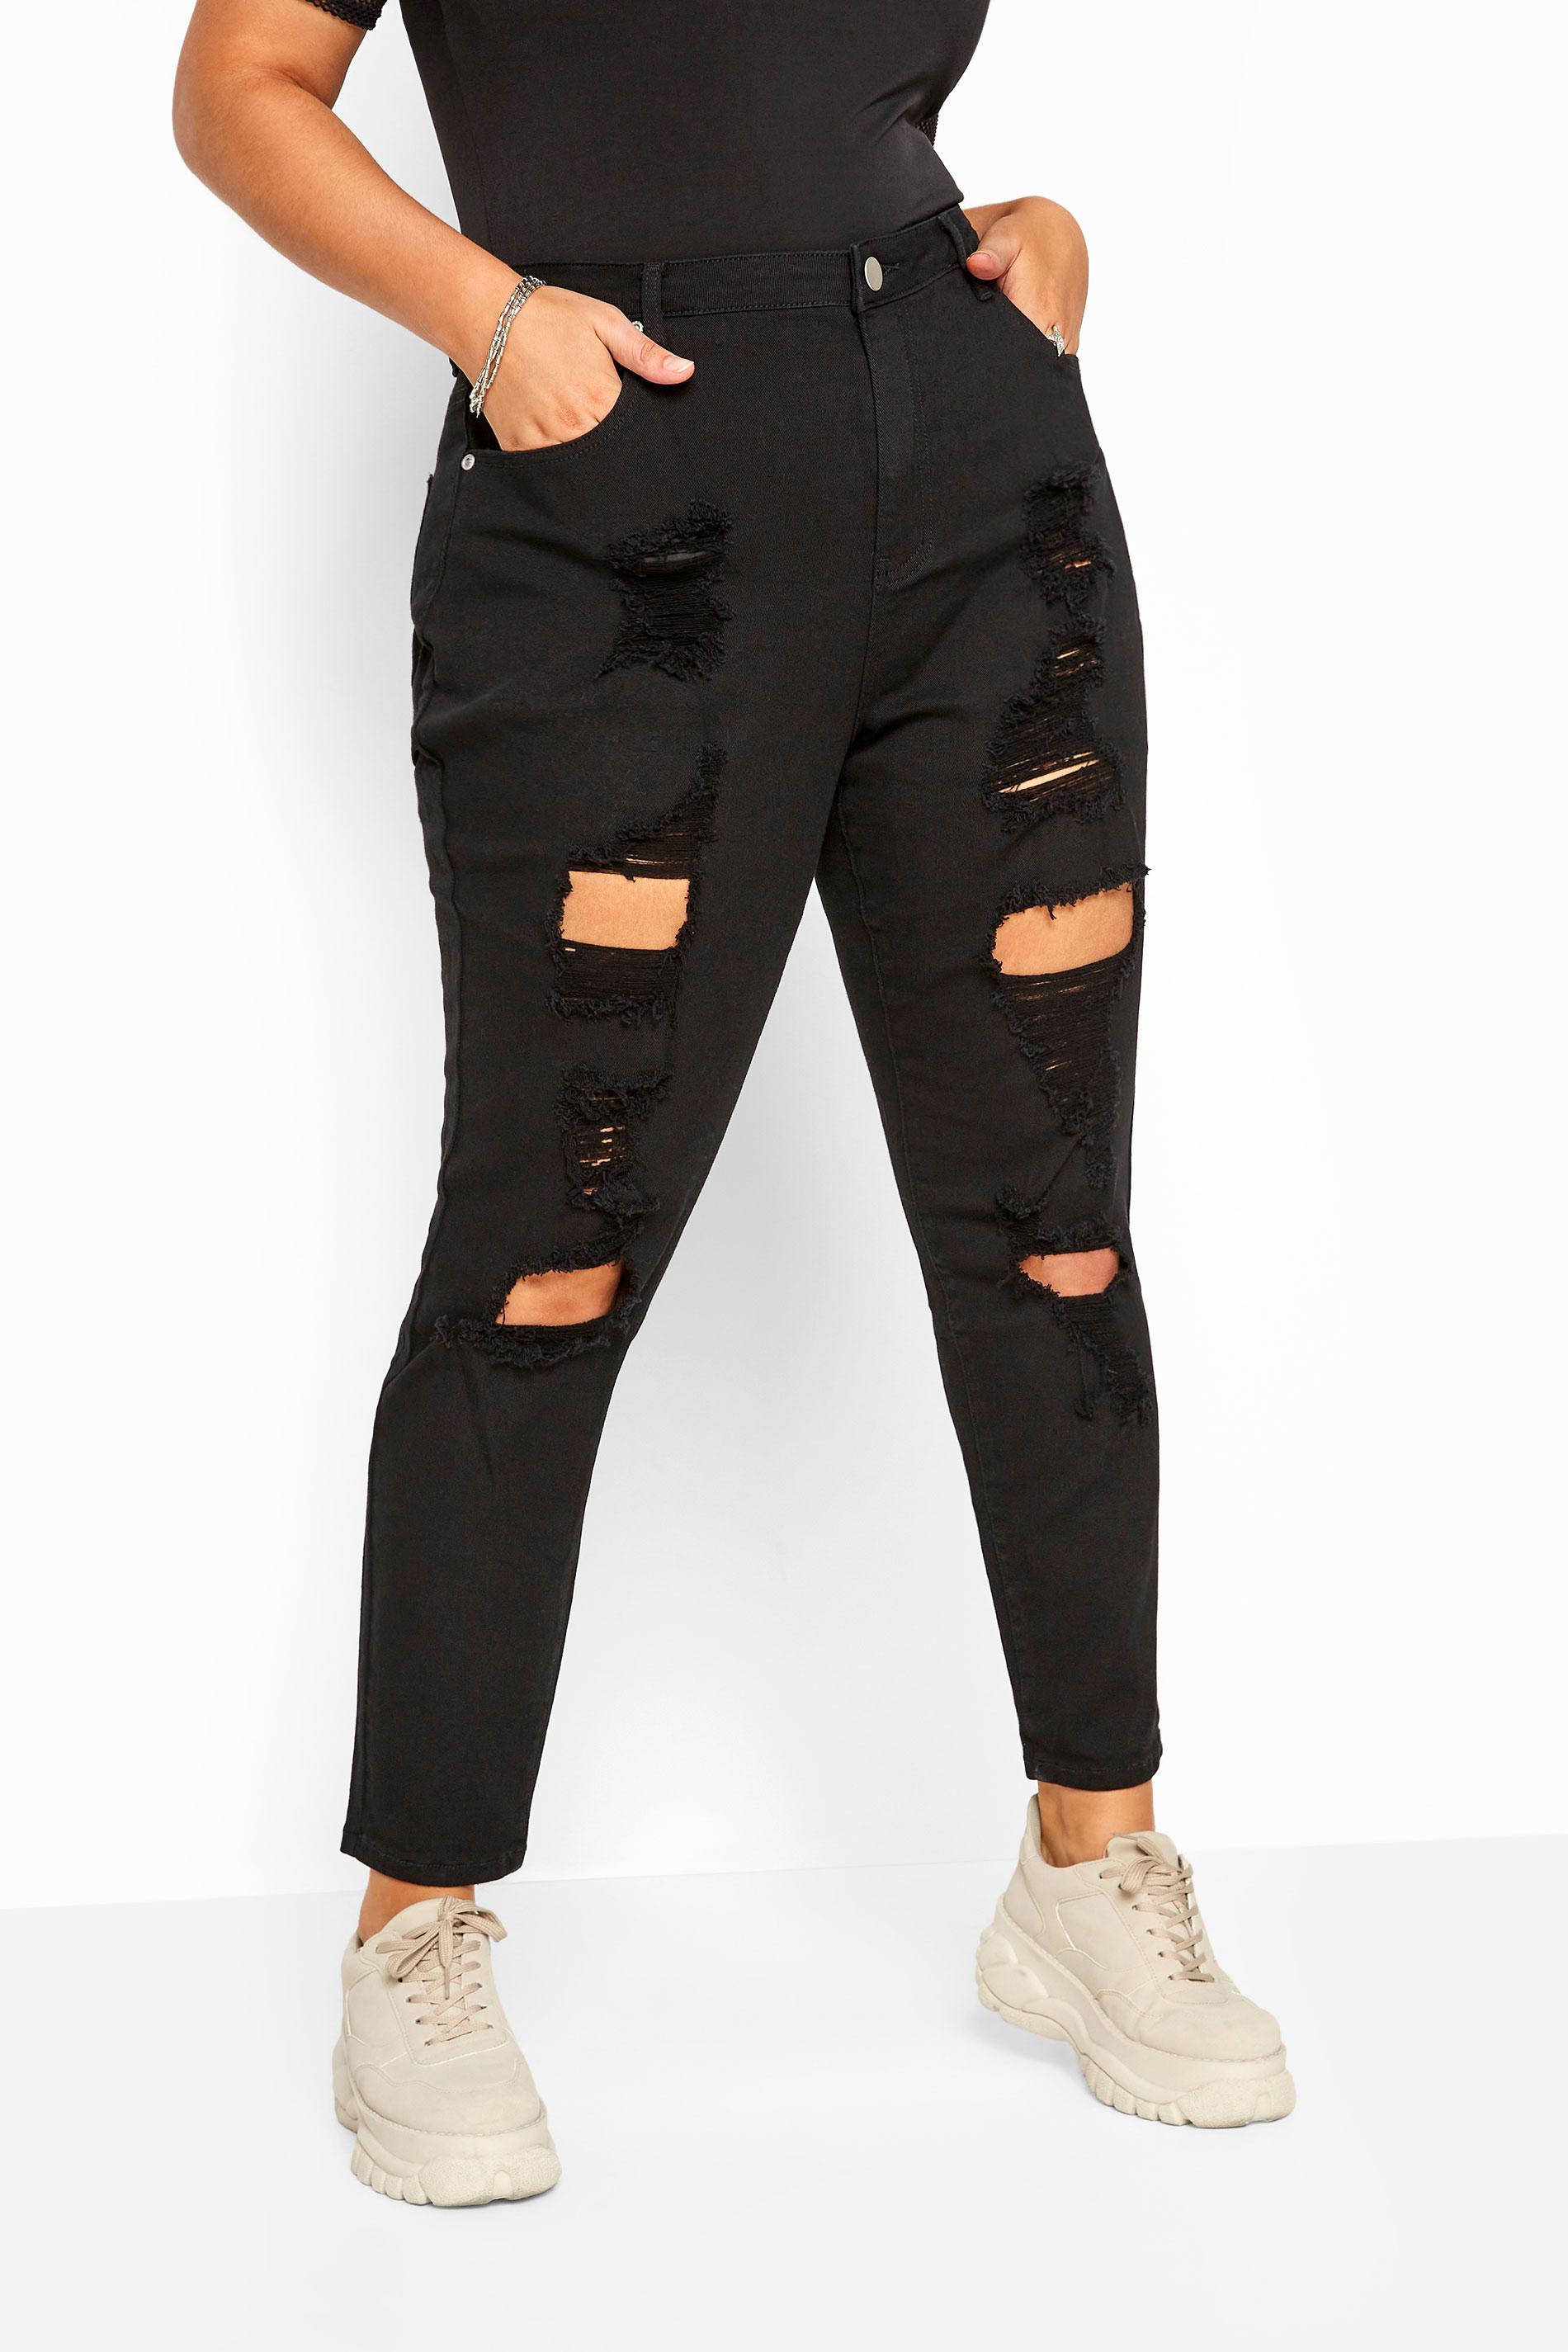 Black Distressed Ripped Skinny Stretch AVA Jeans_142461B.jpg